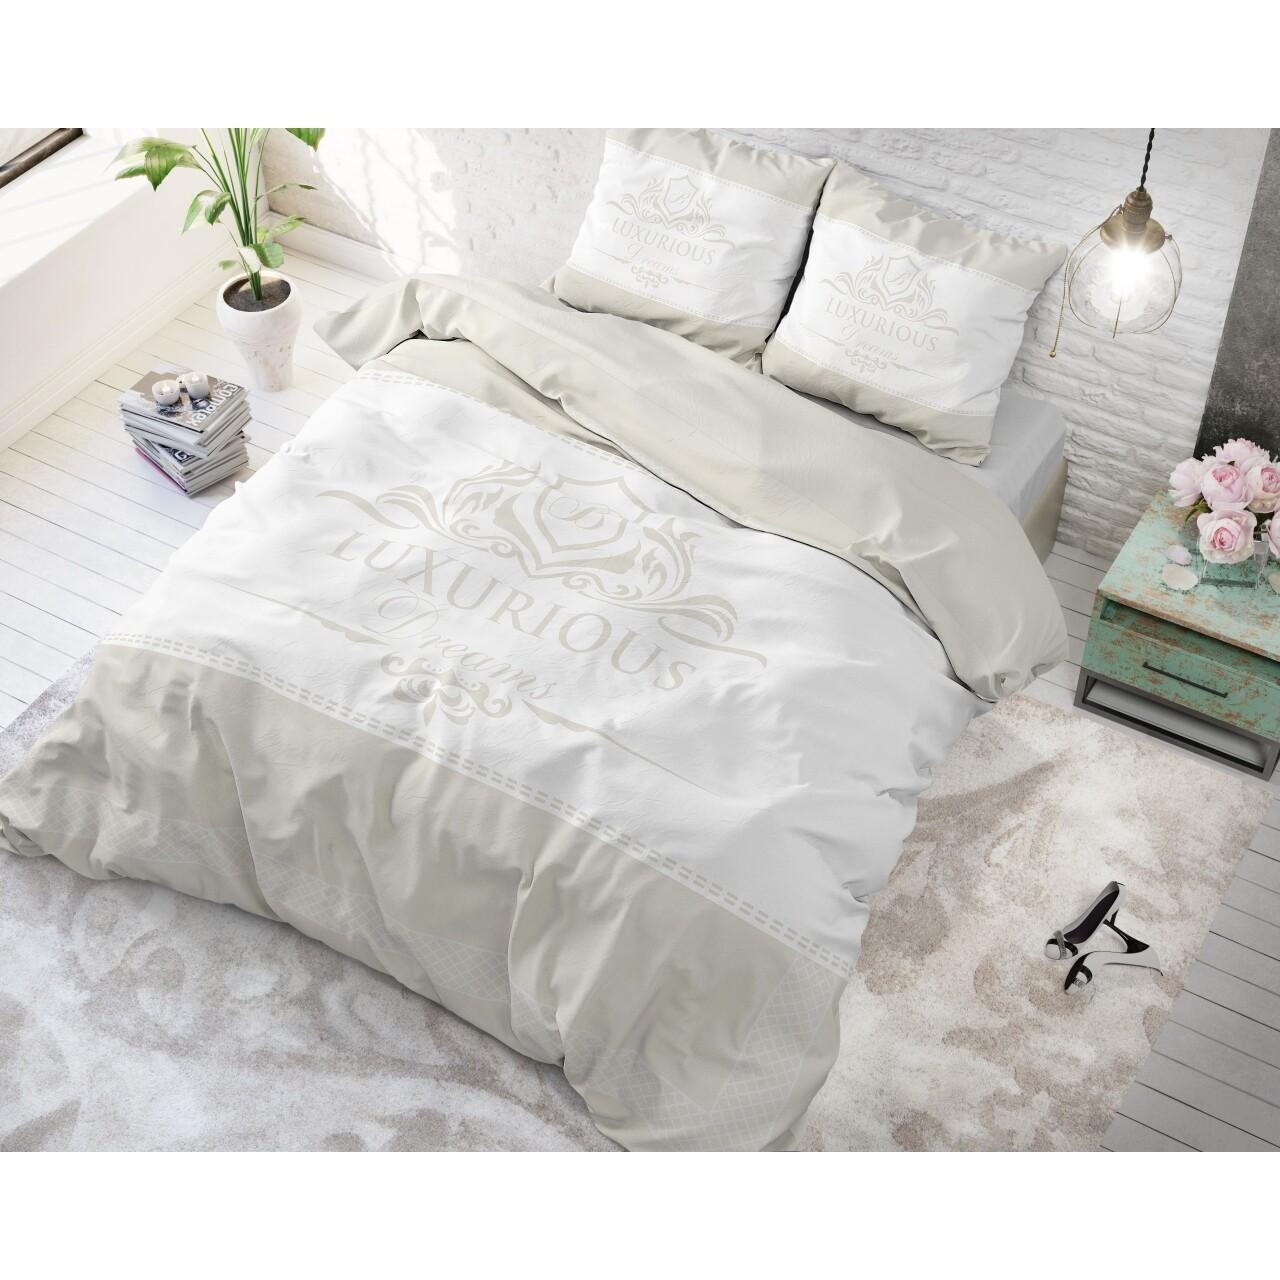 Lenjerie de pat pentru doua persoane Luxurious Cream, Royal Textile, 3 piese, 200 x 220 cm, 100% bumbac, crem